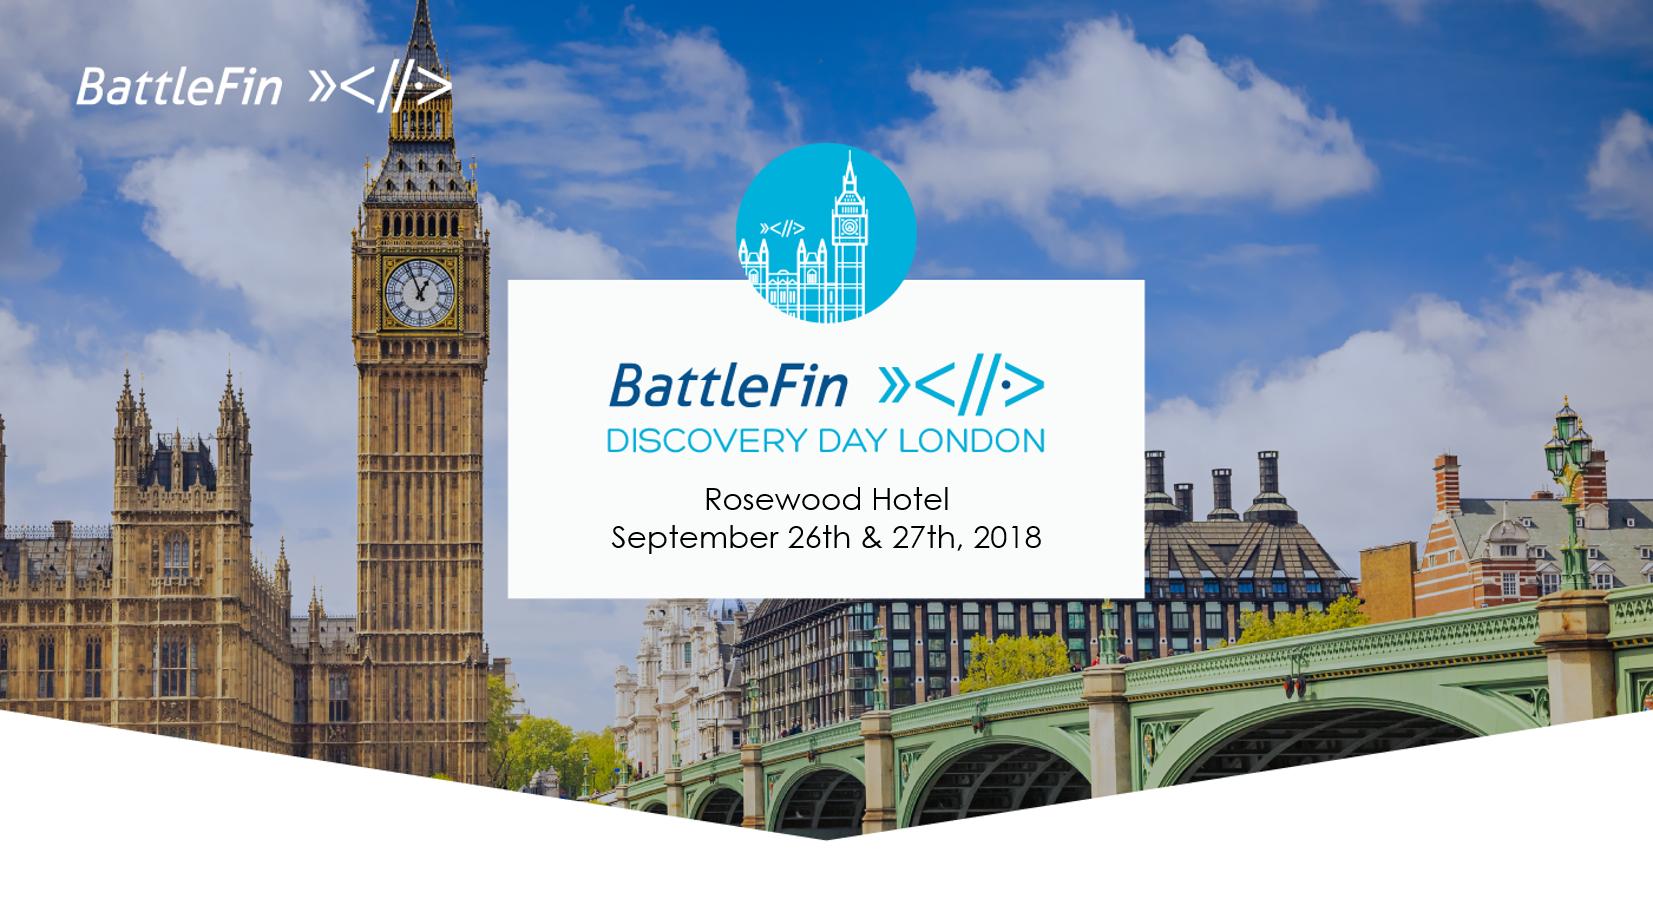 battlefin-london-2018-header